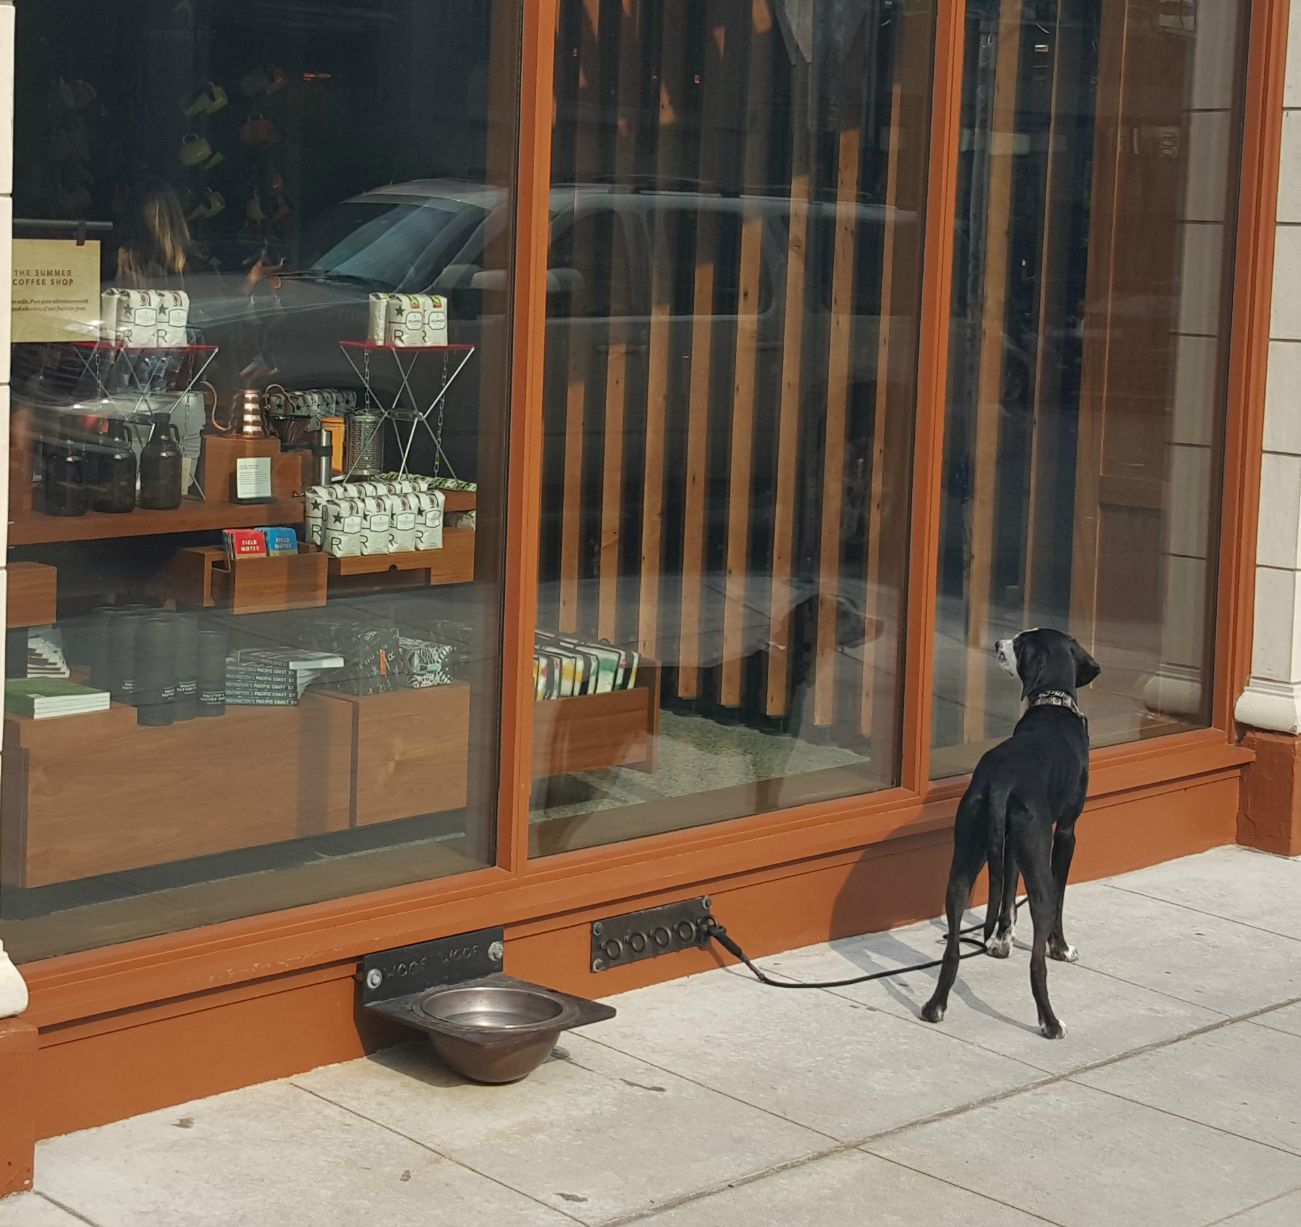 1-1-20150802_093010-Dog-is-waiting-on-mom-or-dad.jpg